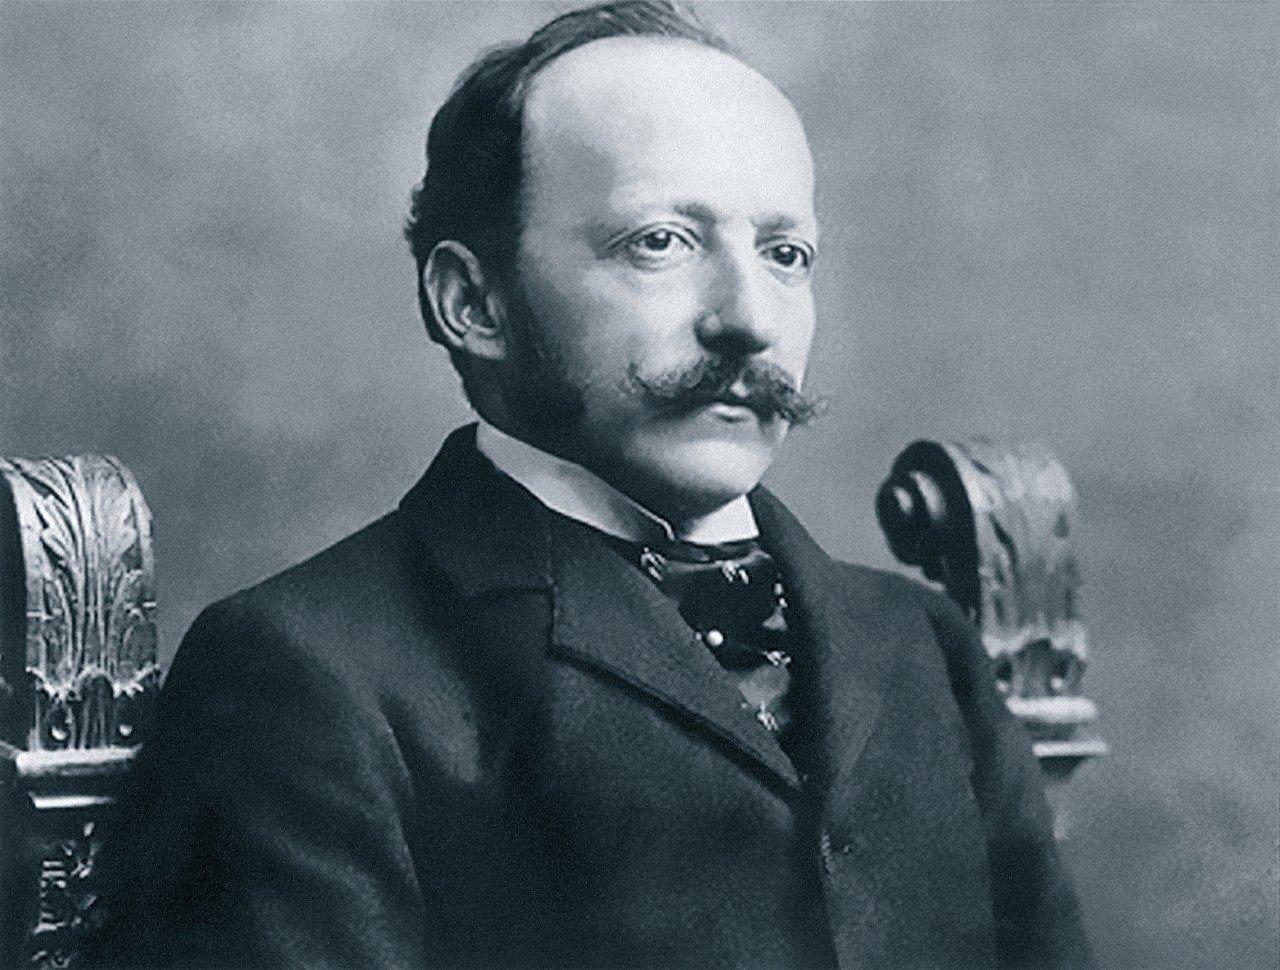 Chân dung César Ritz